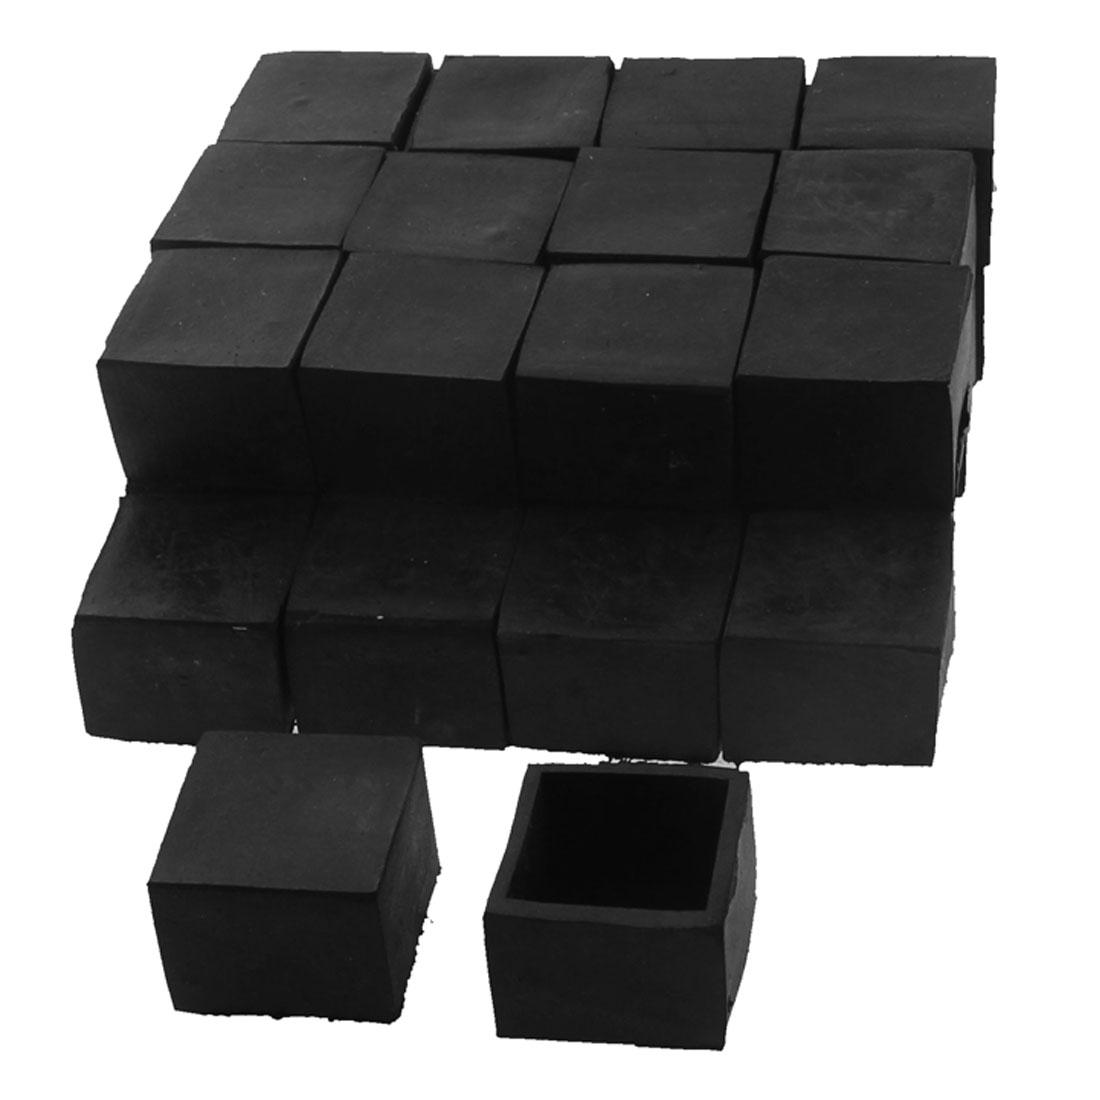 30mm x 30mm Square Shaped Furniture Table Desk Foot Leg Rubber End Cap Cover Black 30pcs